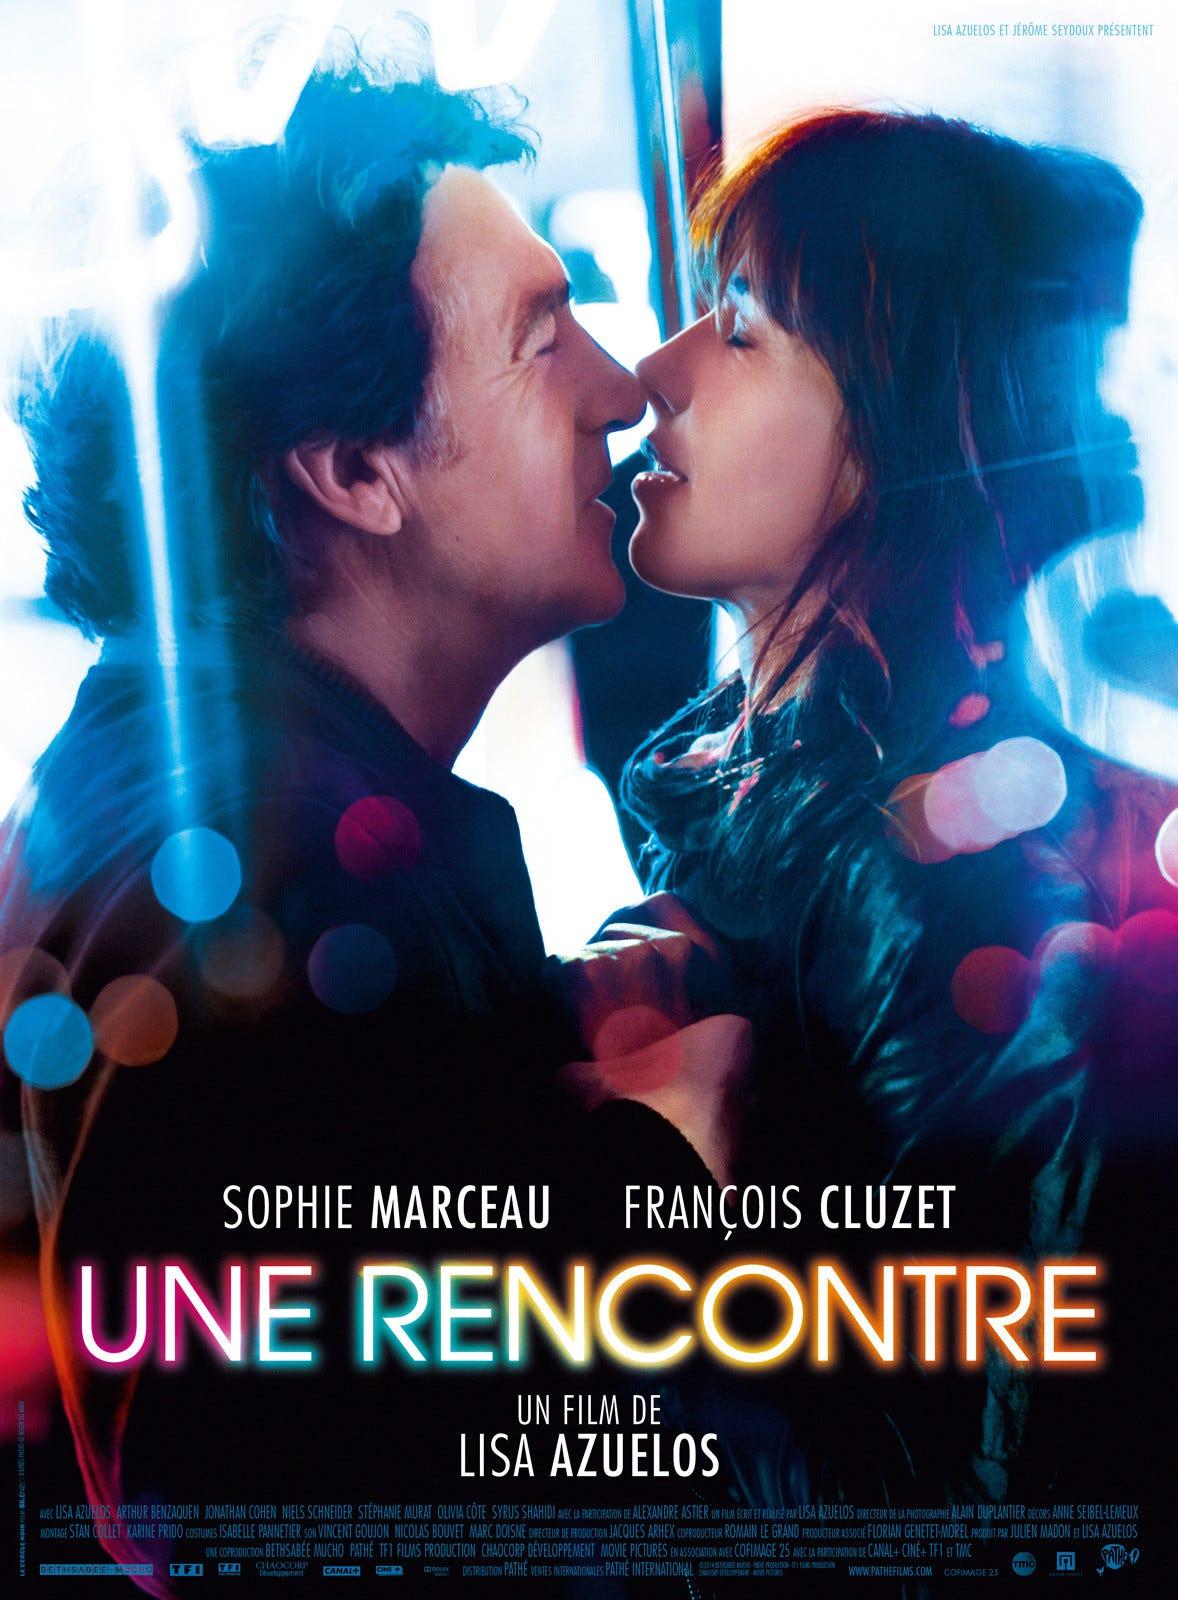 Youtube Film Complet Vf Romance : youtube, complet, romance, Regarder)~, Belle, Rencontre((2016)), Complet, FR|Films, Meilleurs, Maintenant, Filmfrance, Medium